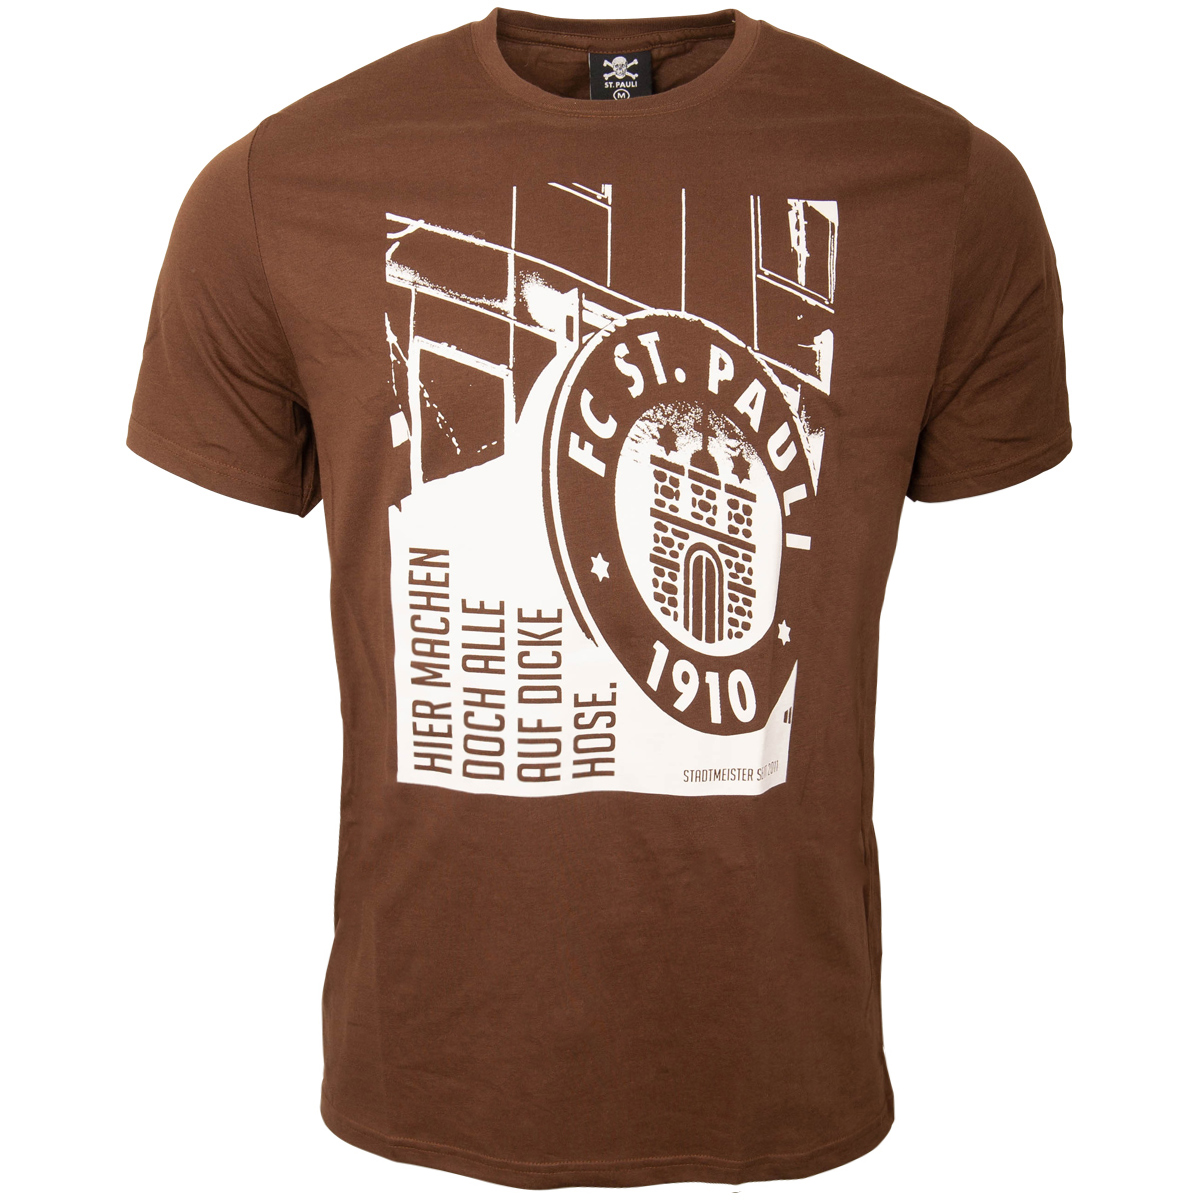 6d60b11fd6209 FC St. Pauli - Braunes T-Shirt Dicke Hose | ROCKnSHOP